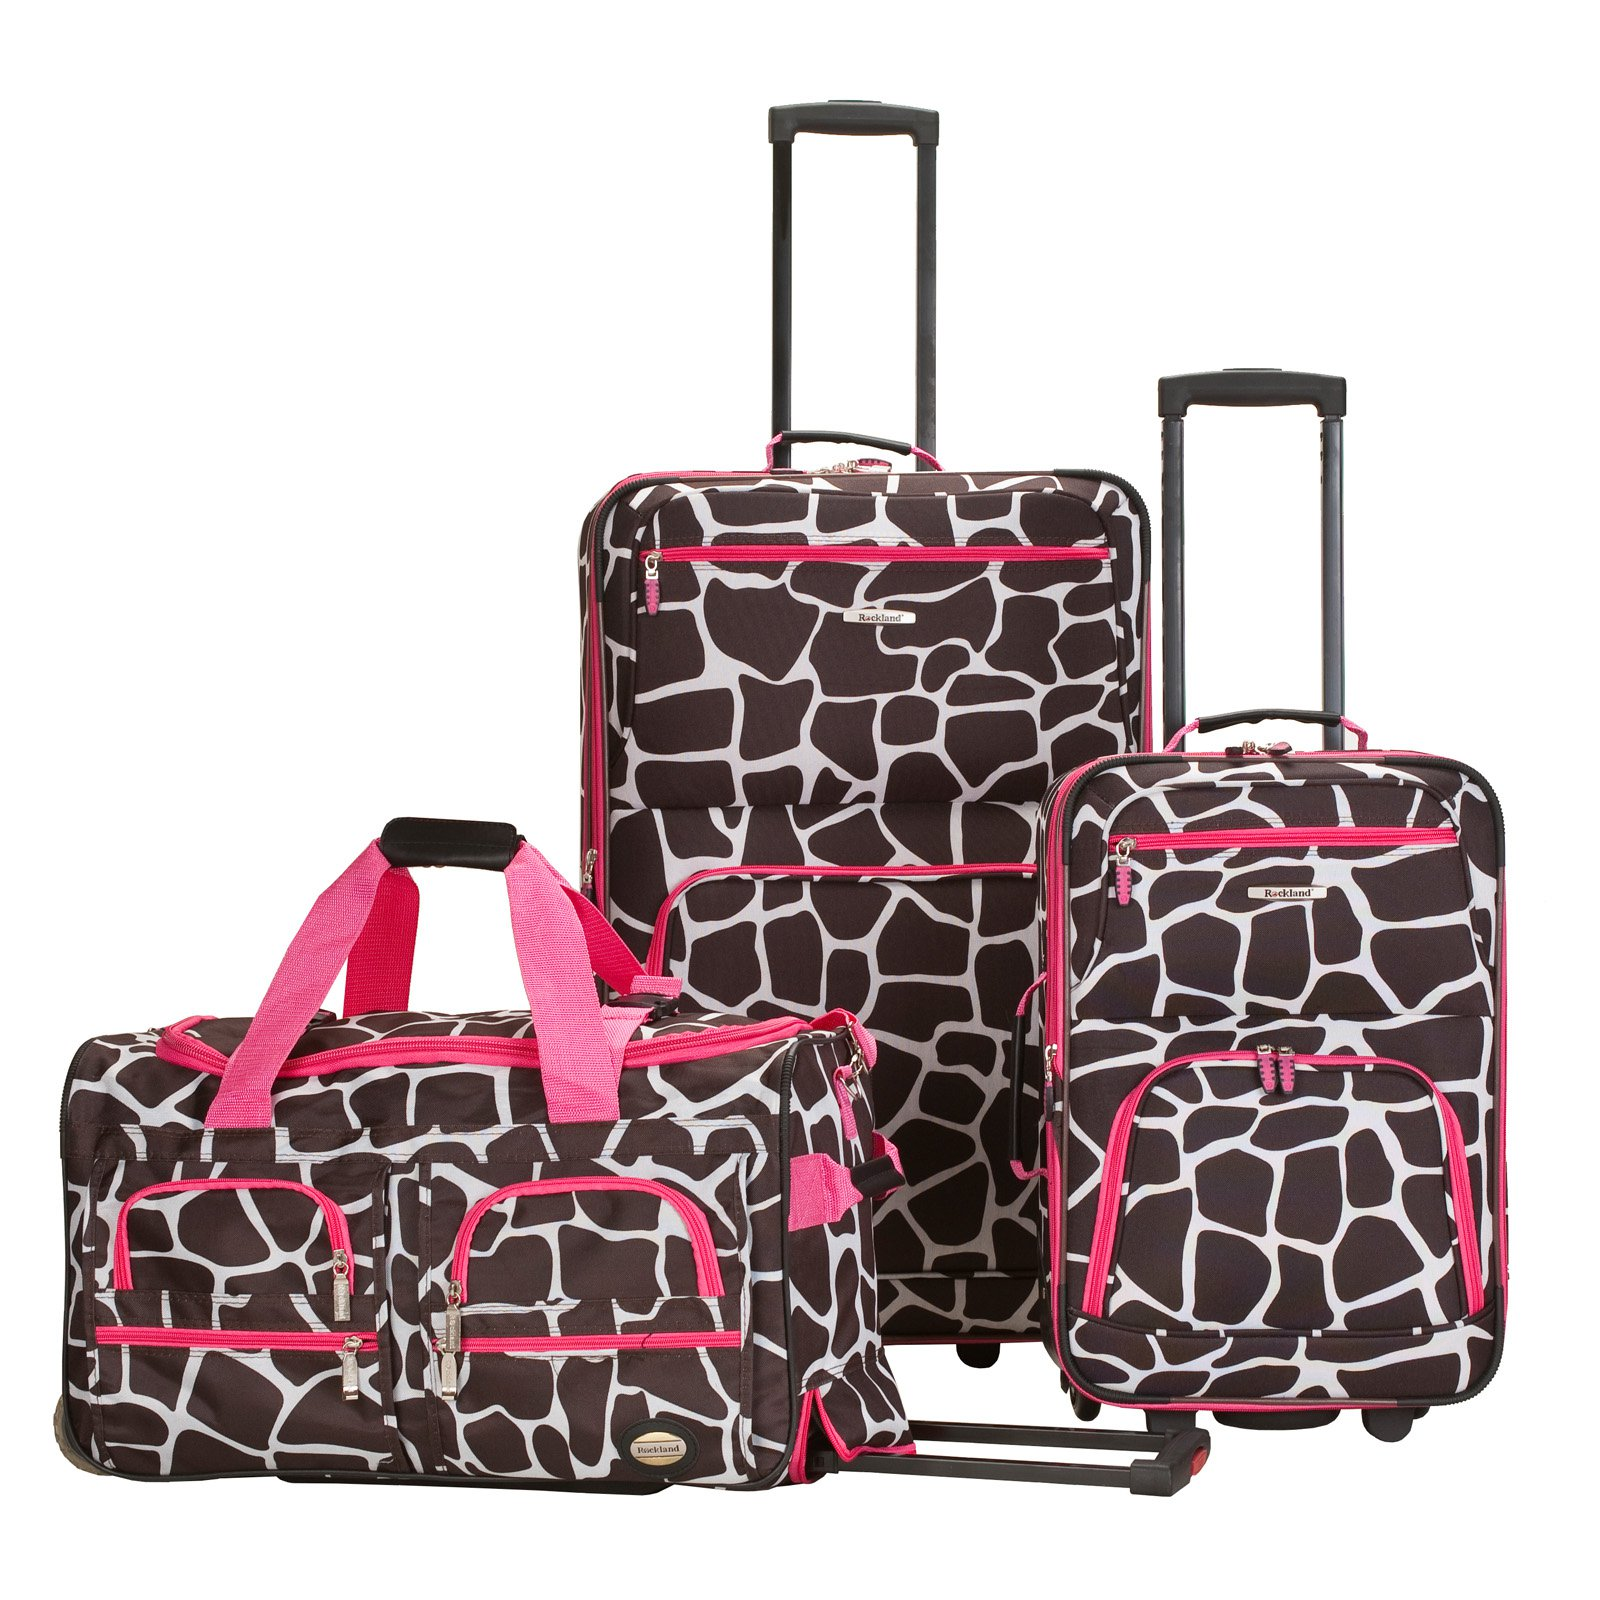 Rockland Luggage Spectra 3-Piece Rolling Luggage Set - Walmart.com